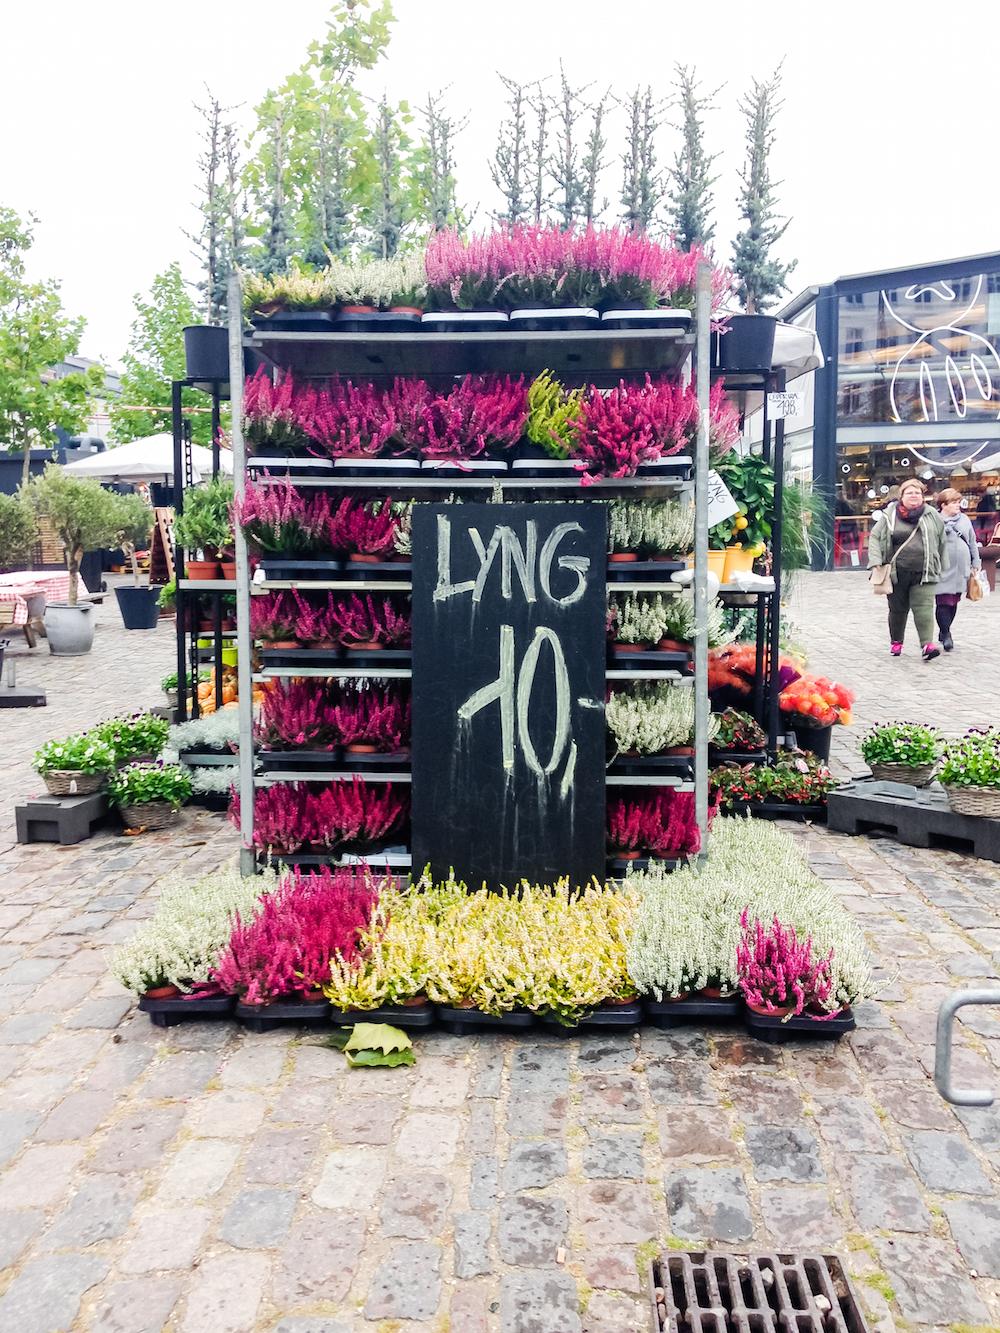 Copenhagen Flower Stalls